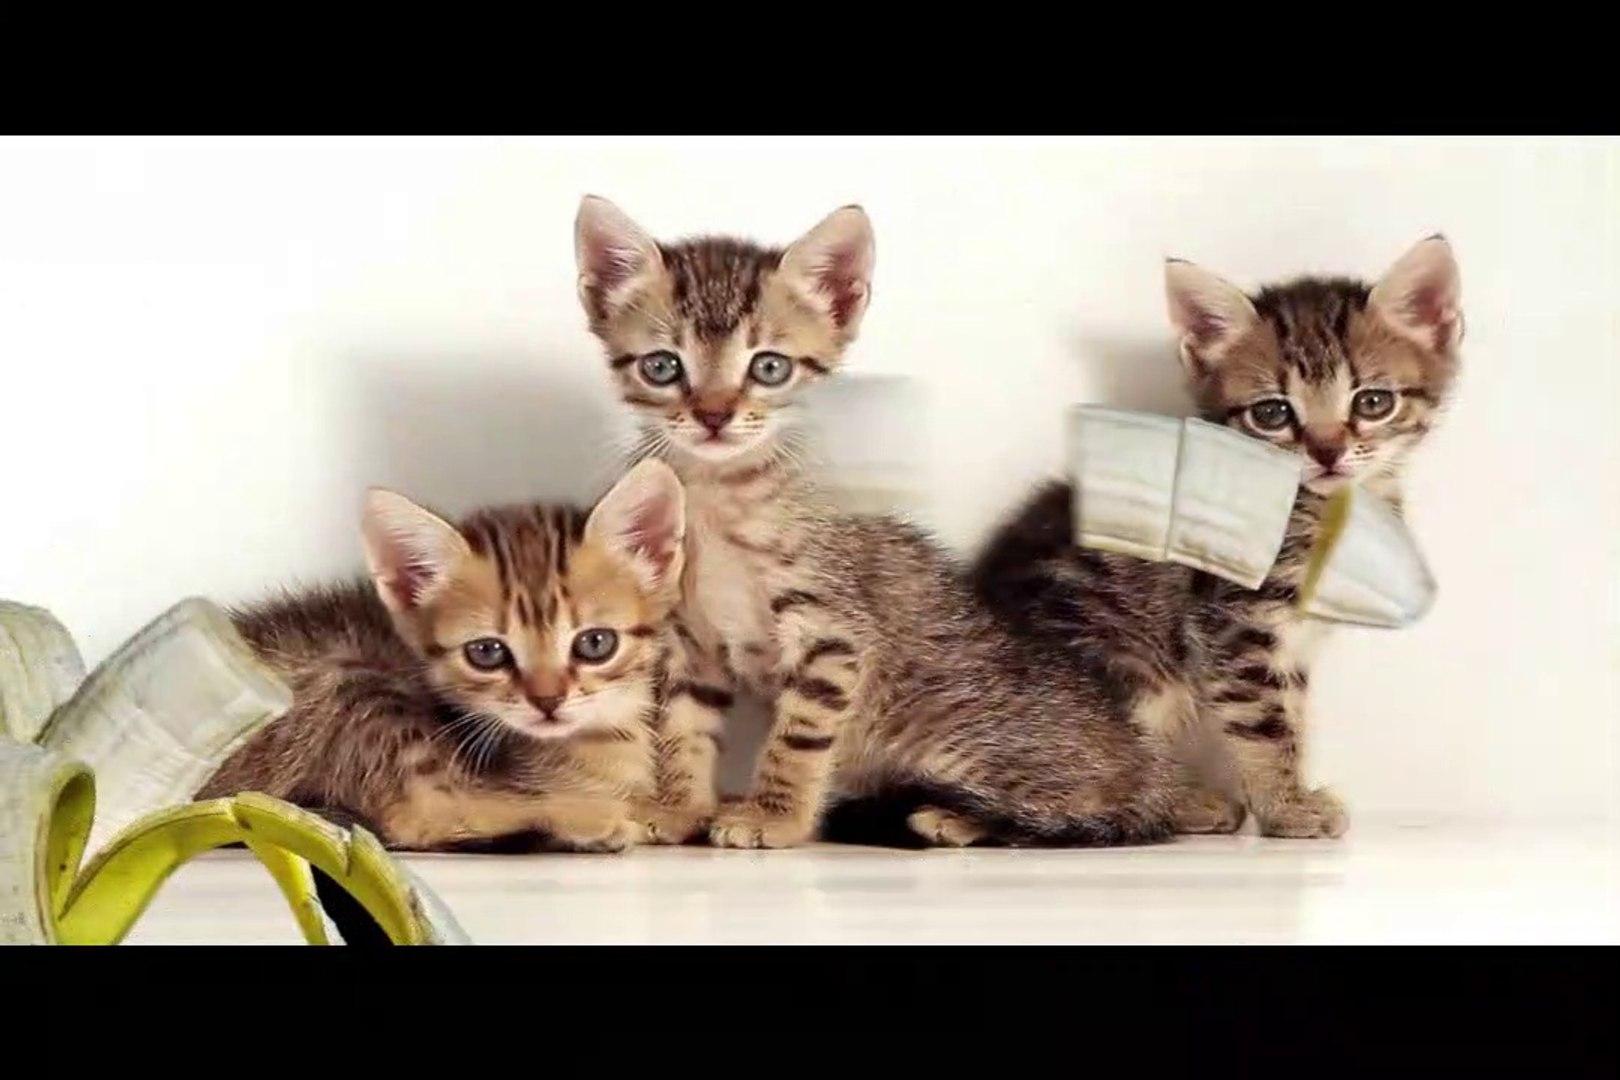 Cute cats| Cats are Cute| Cute cat videos | Cute cat funny videos|cat| Cats|kittens|three little kit